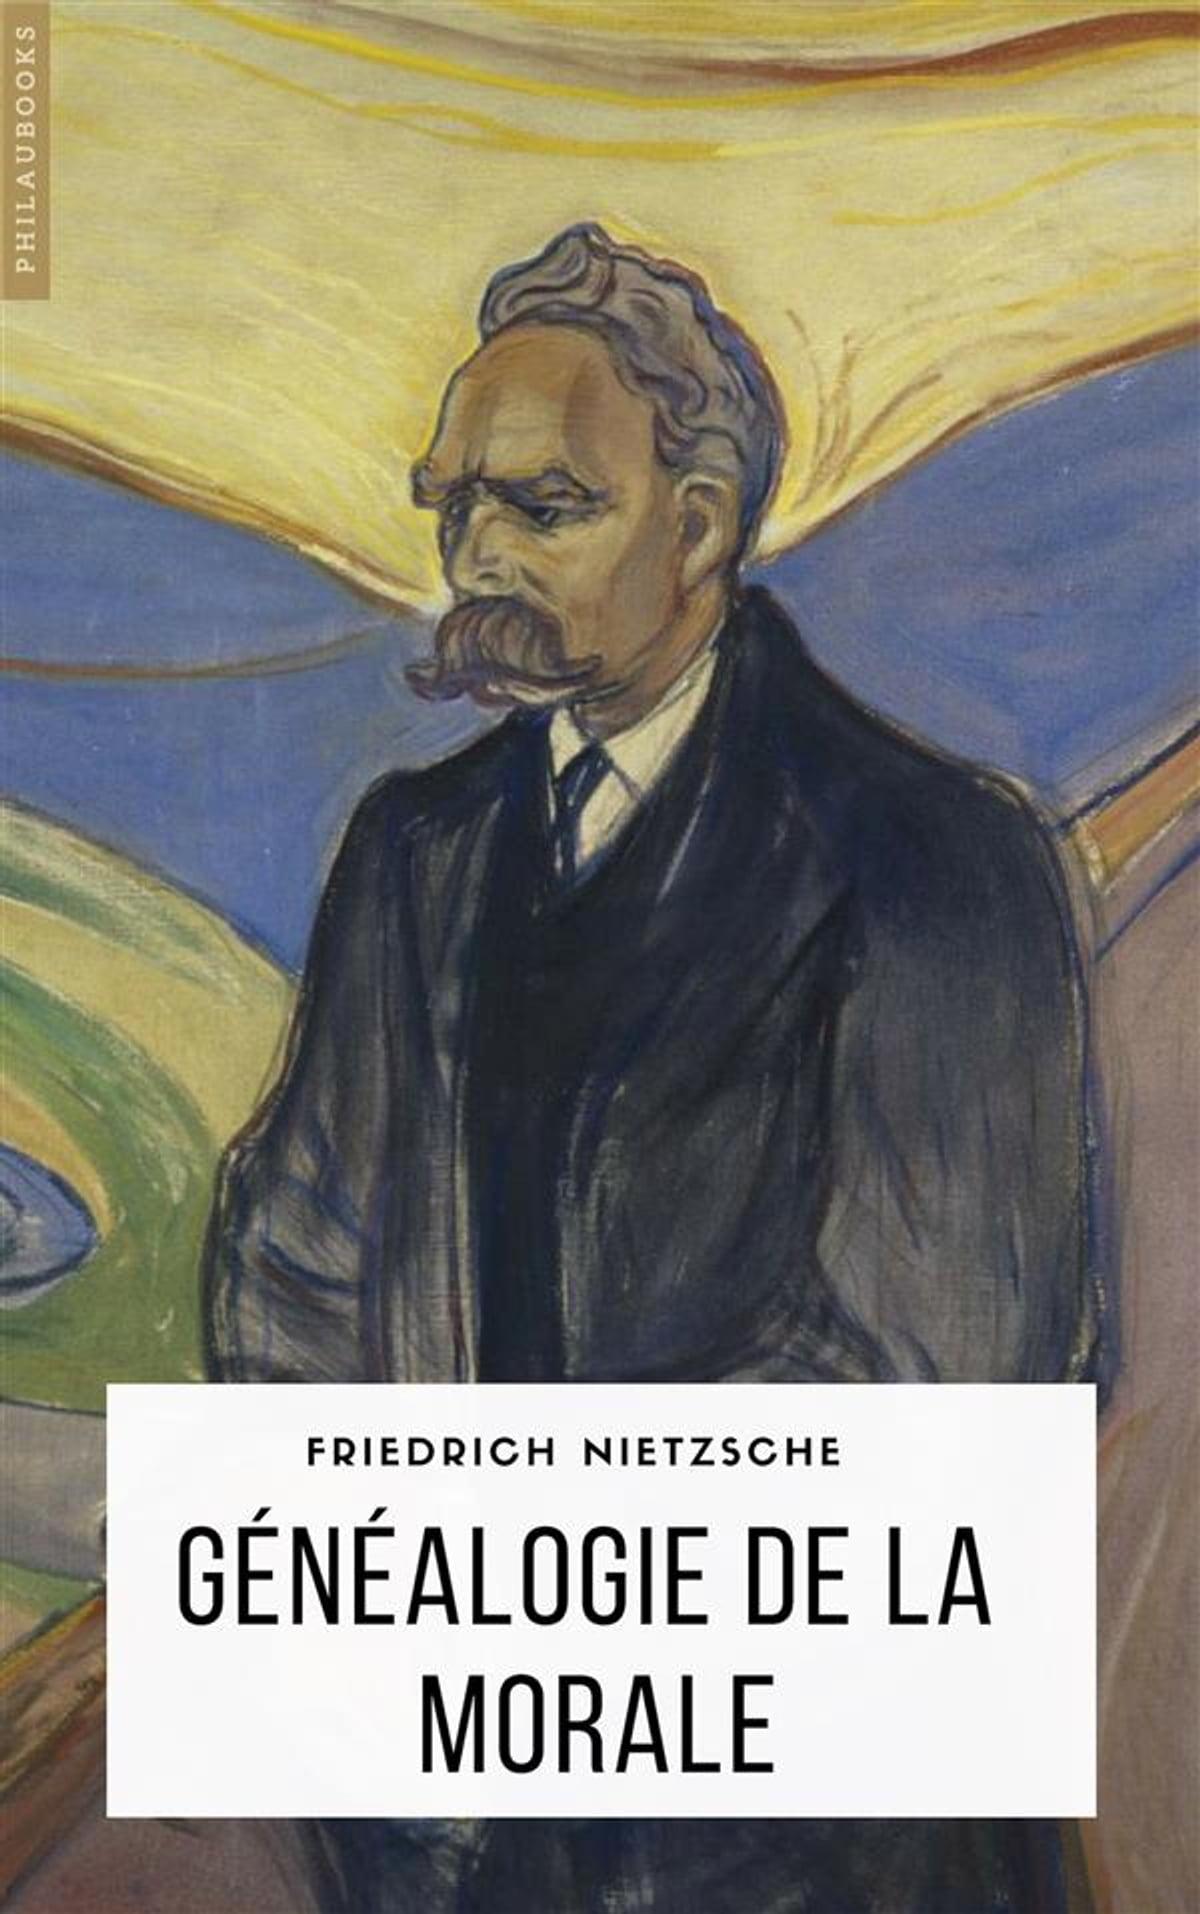 Nietzsche Généalogie De La Morale : nietzsche, généalogie, morale, Généalogie, Morale, EBook, Friedrich, Nietzsche, 9791037200501, Rakuten, United, States